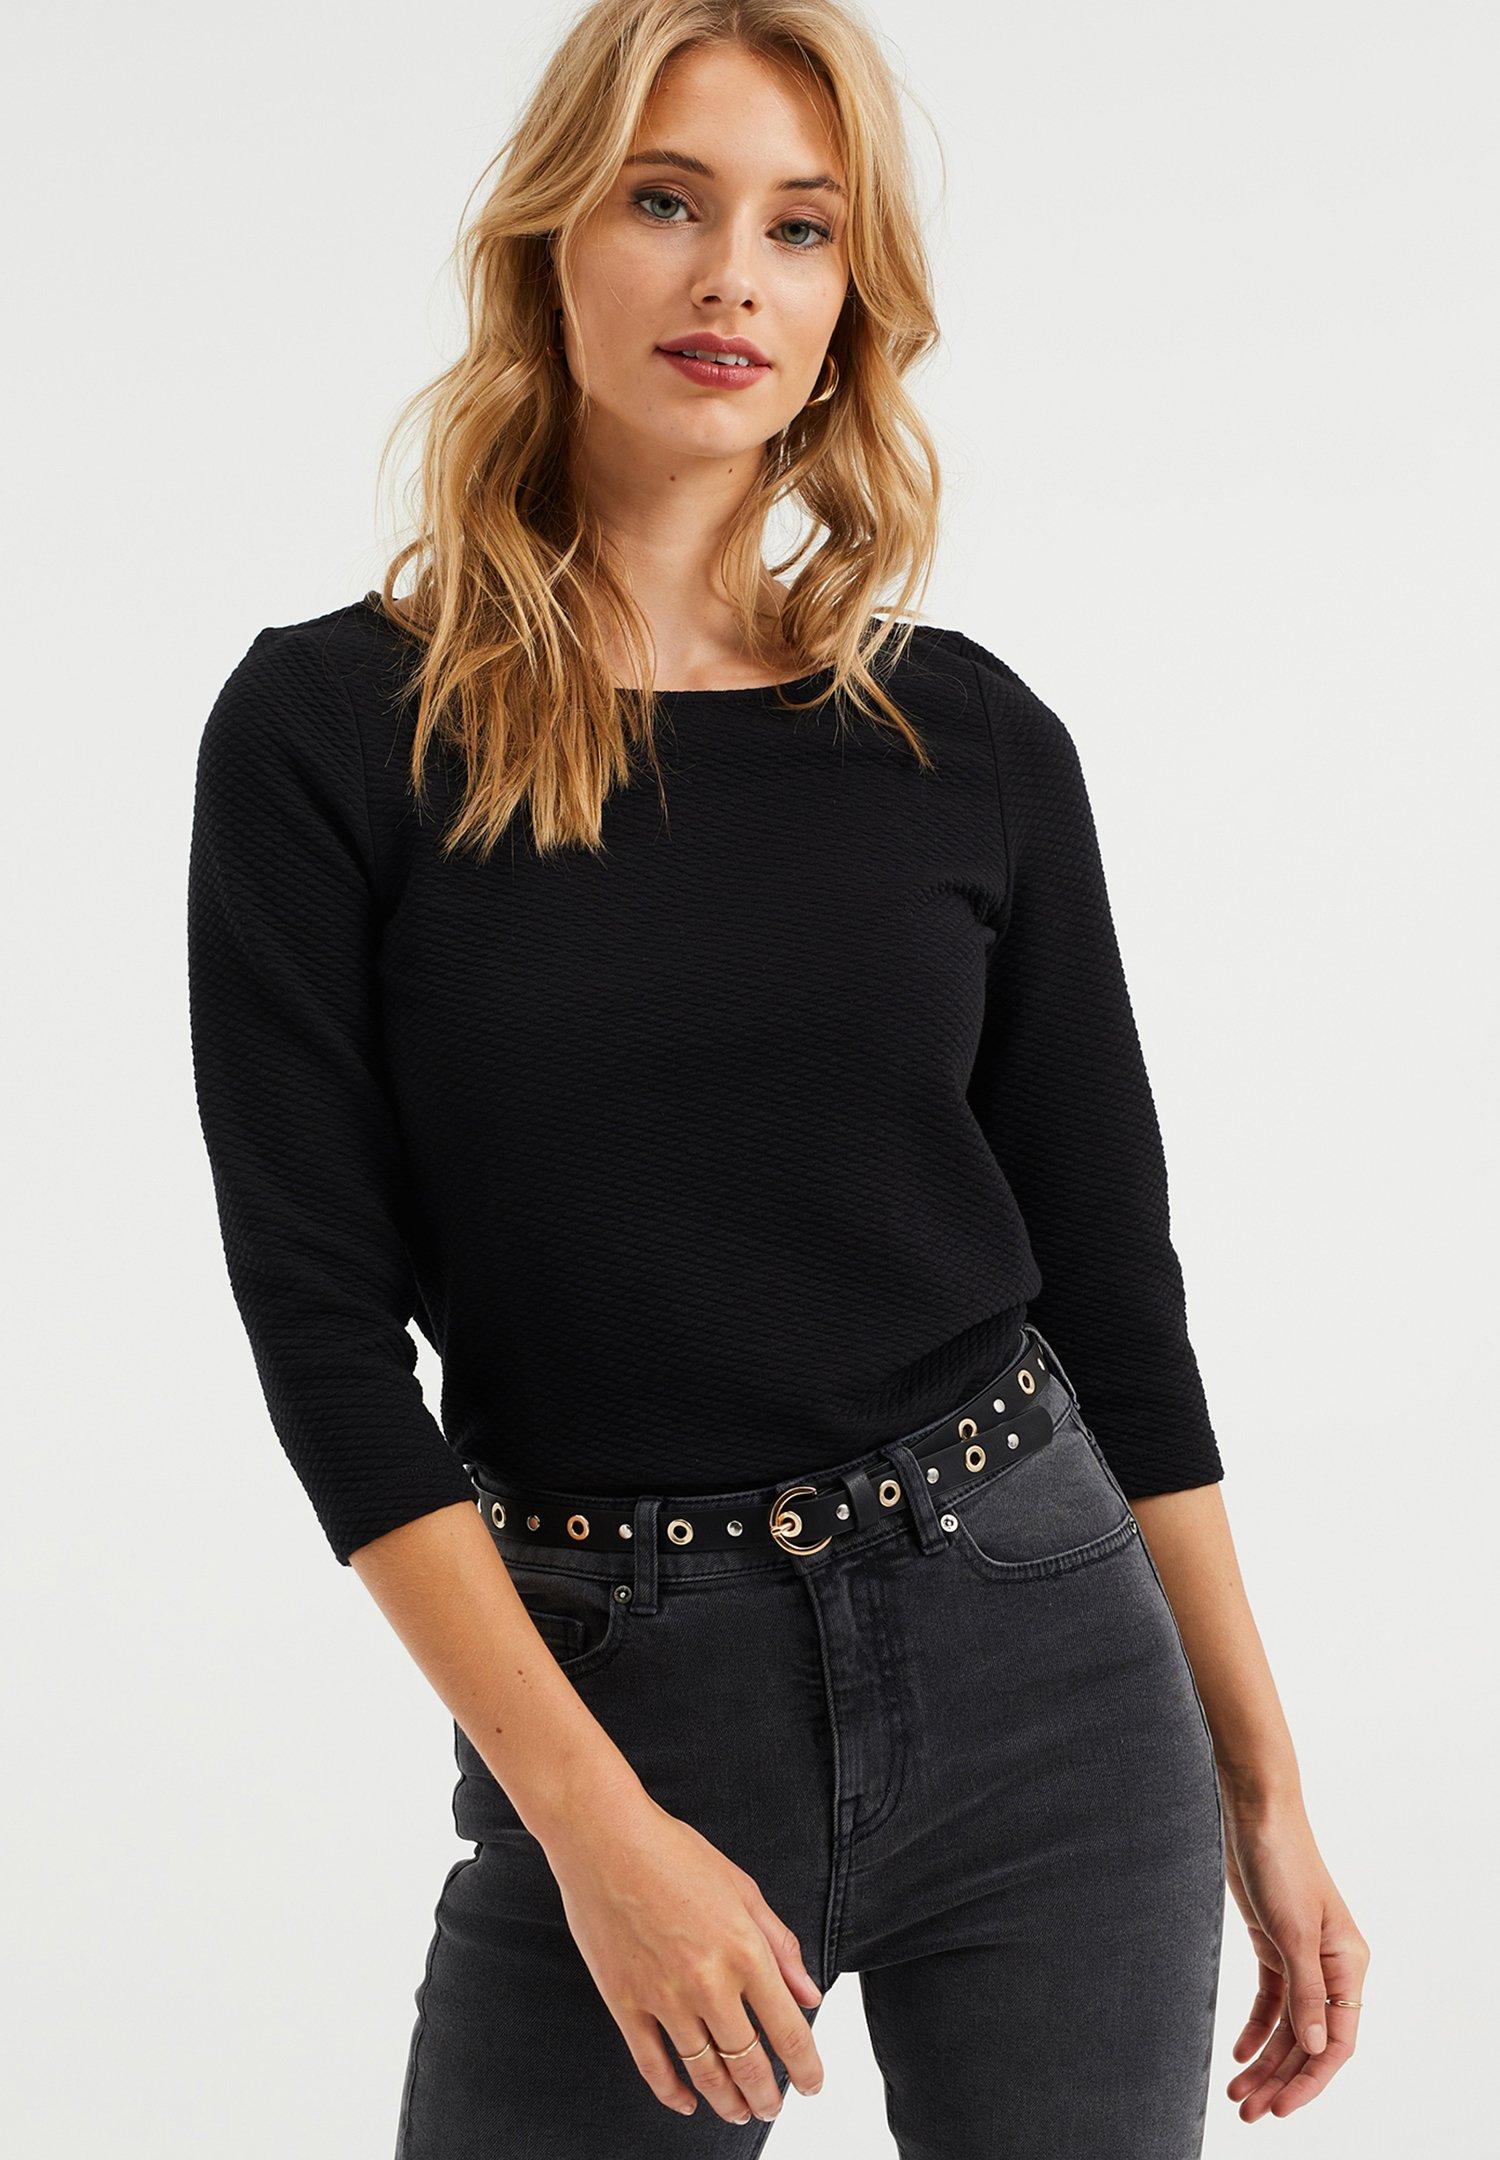 Donna DAMES MET STRUCTUUR - Maglietta a manica lunga